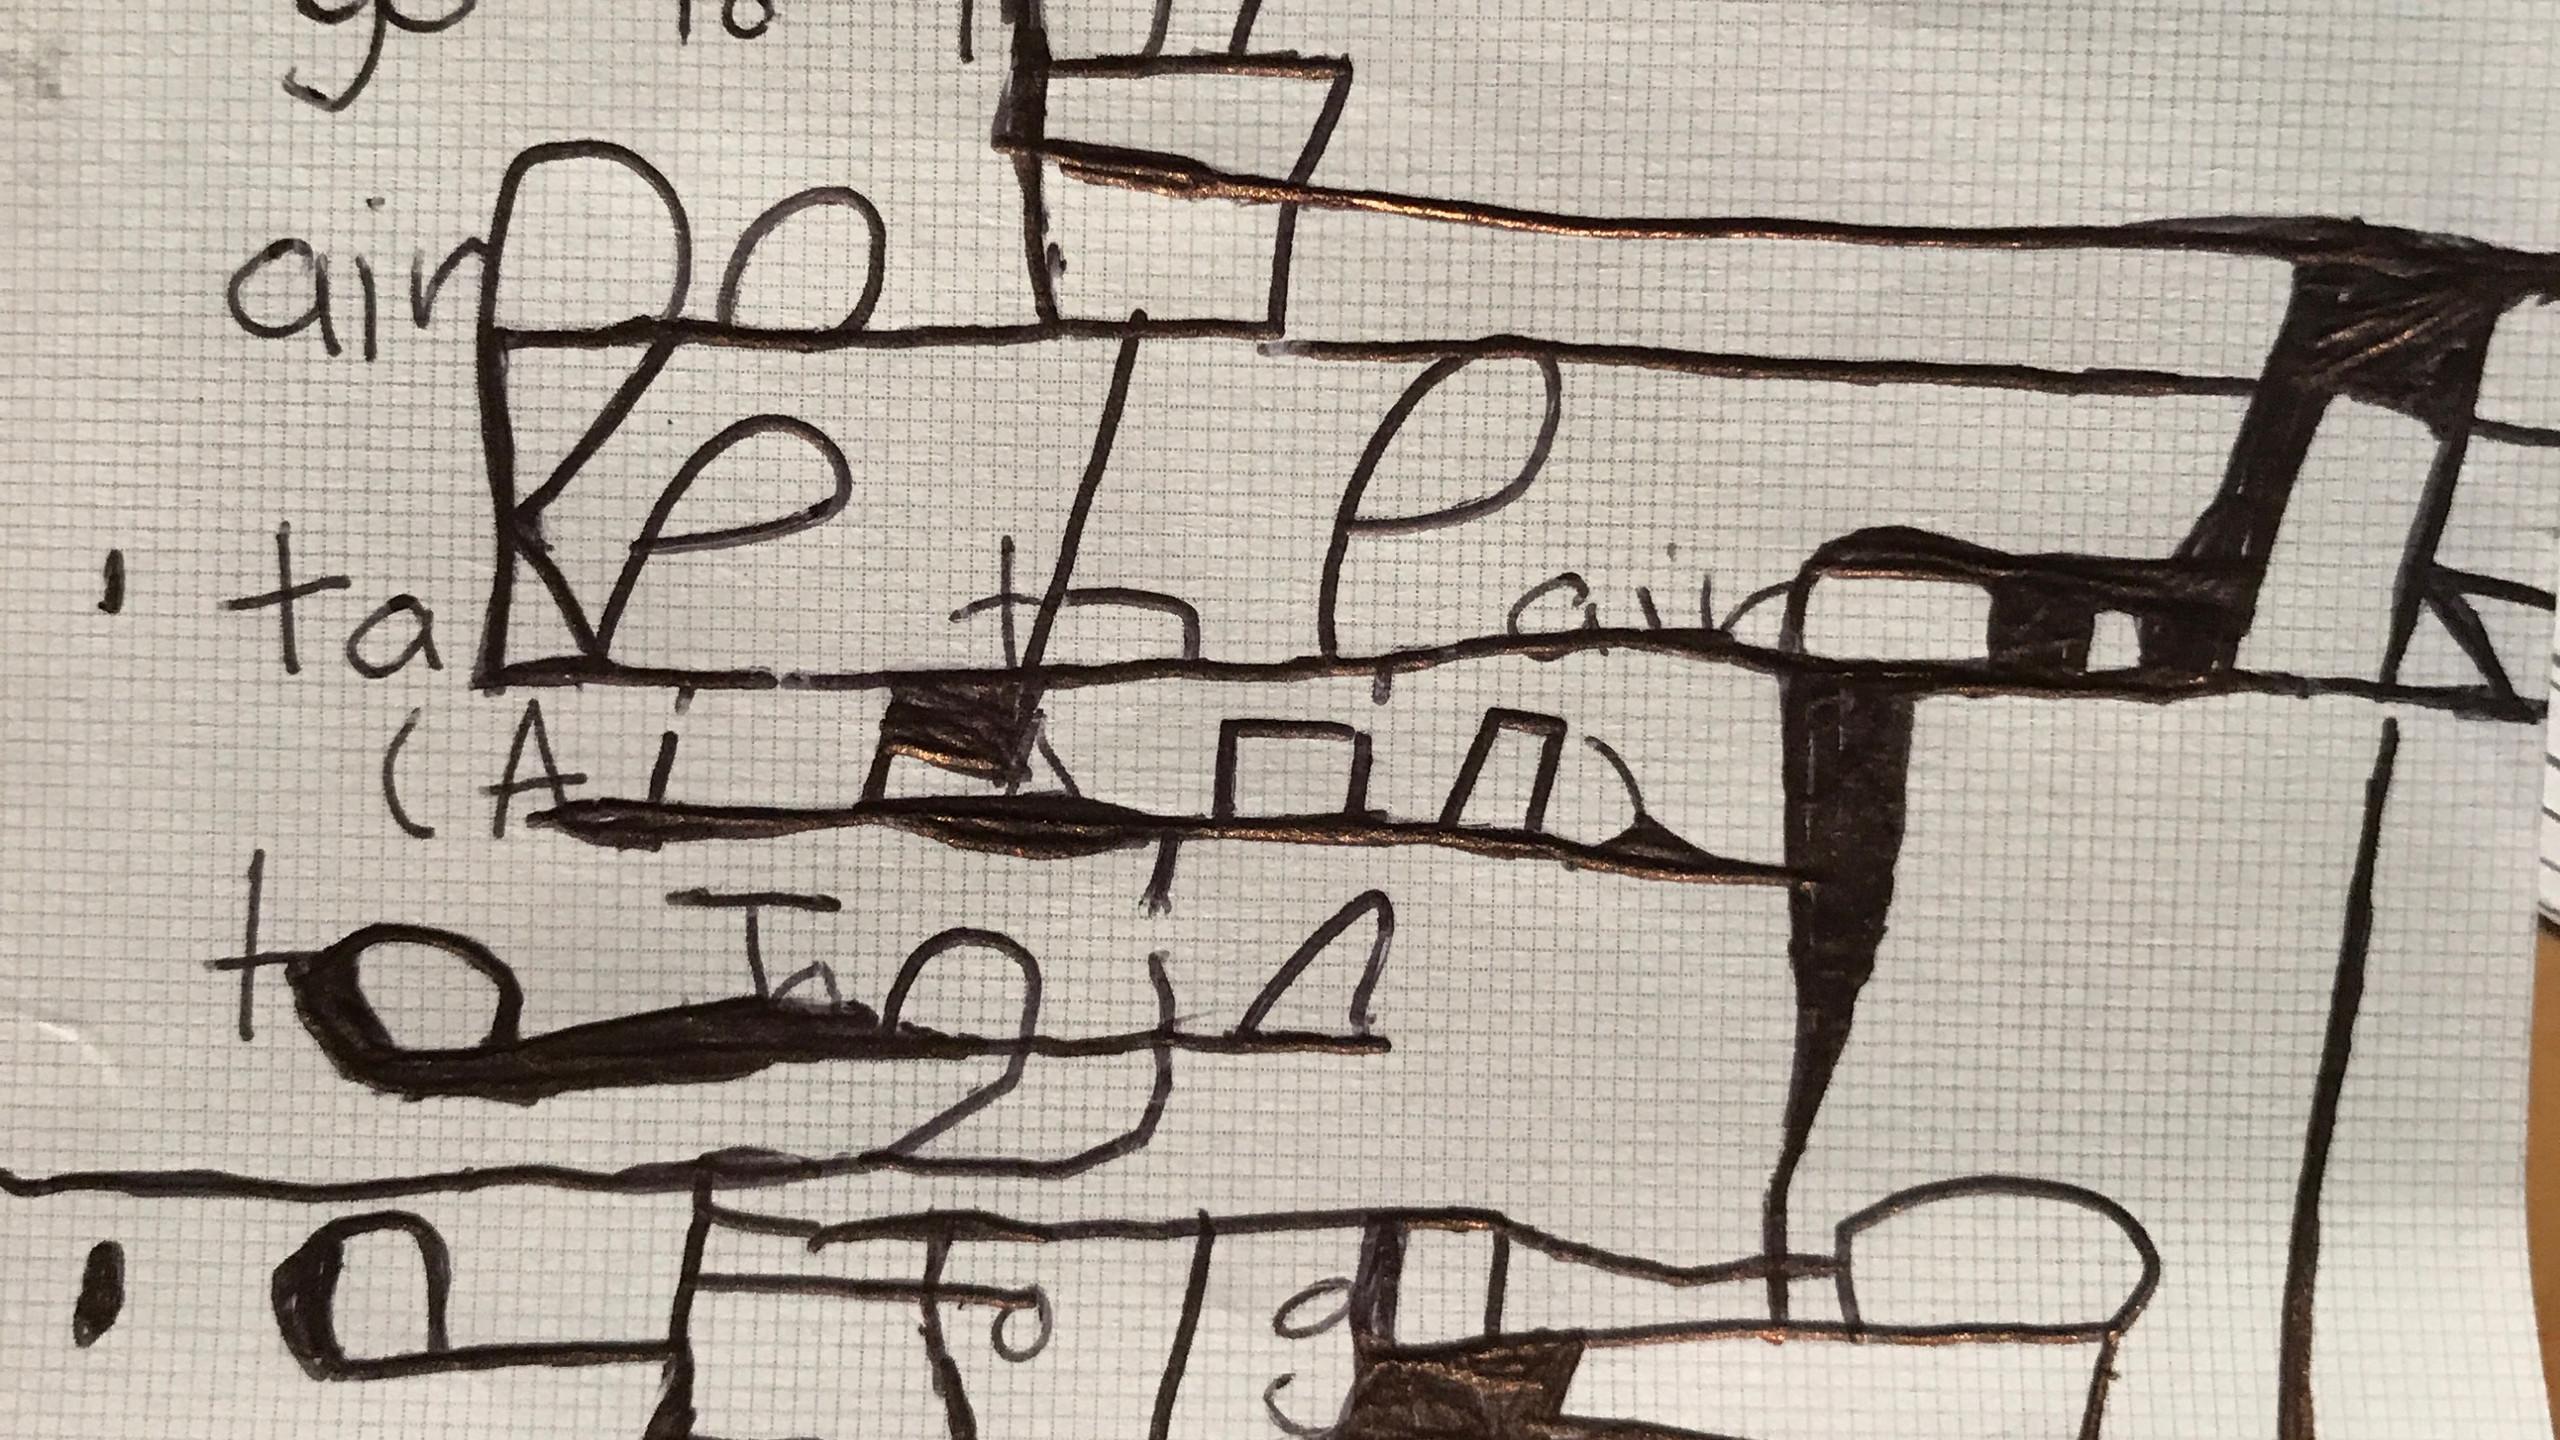 Sebastien's handwriting